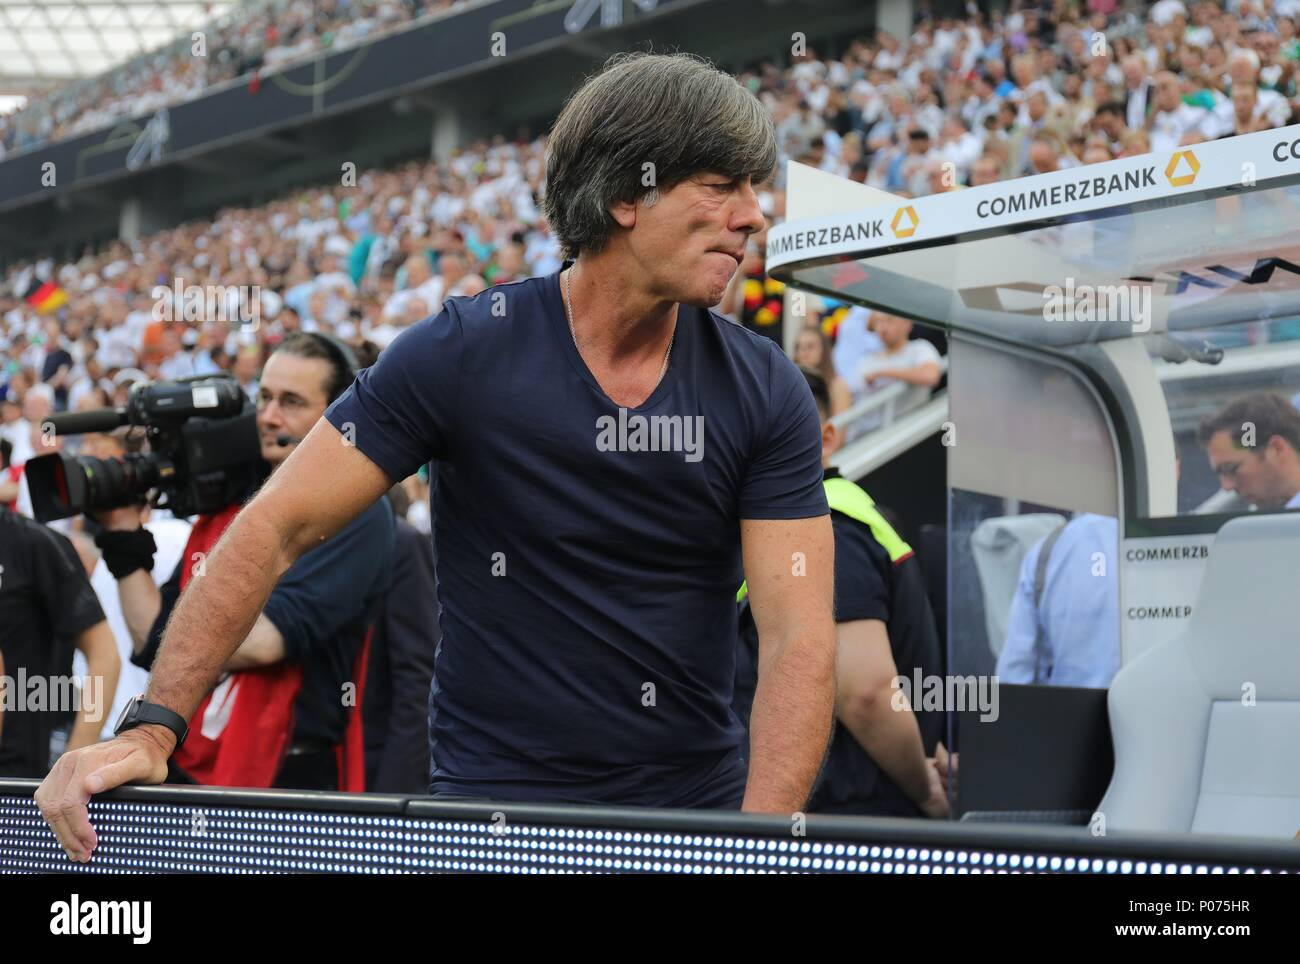 firo Football: Football: 08.06.2018 National team Test match: Germany - Saudi Arabia 2: 1 portrait Bundescoach Joachim Low, Enttausch   usage worldwide - Stock Image